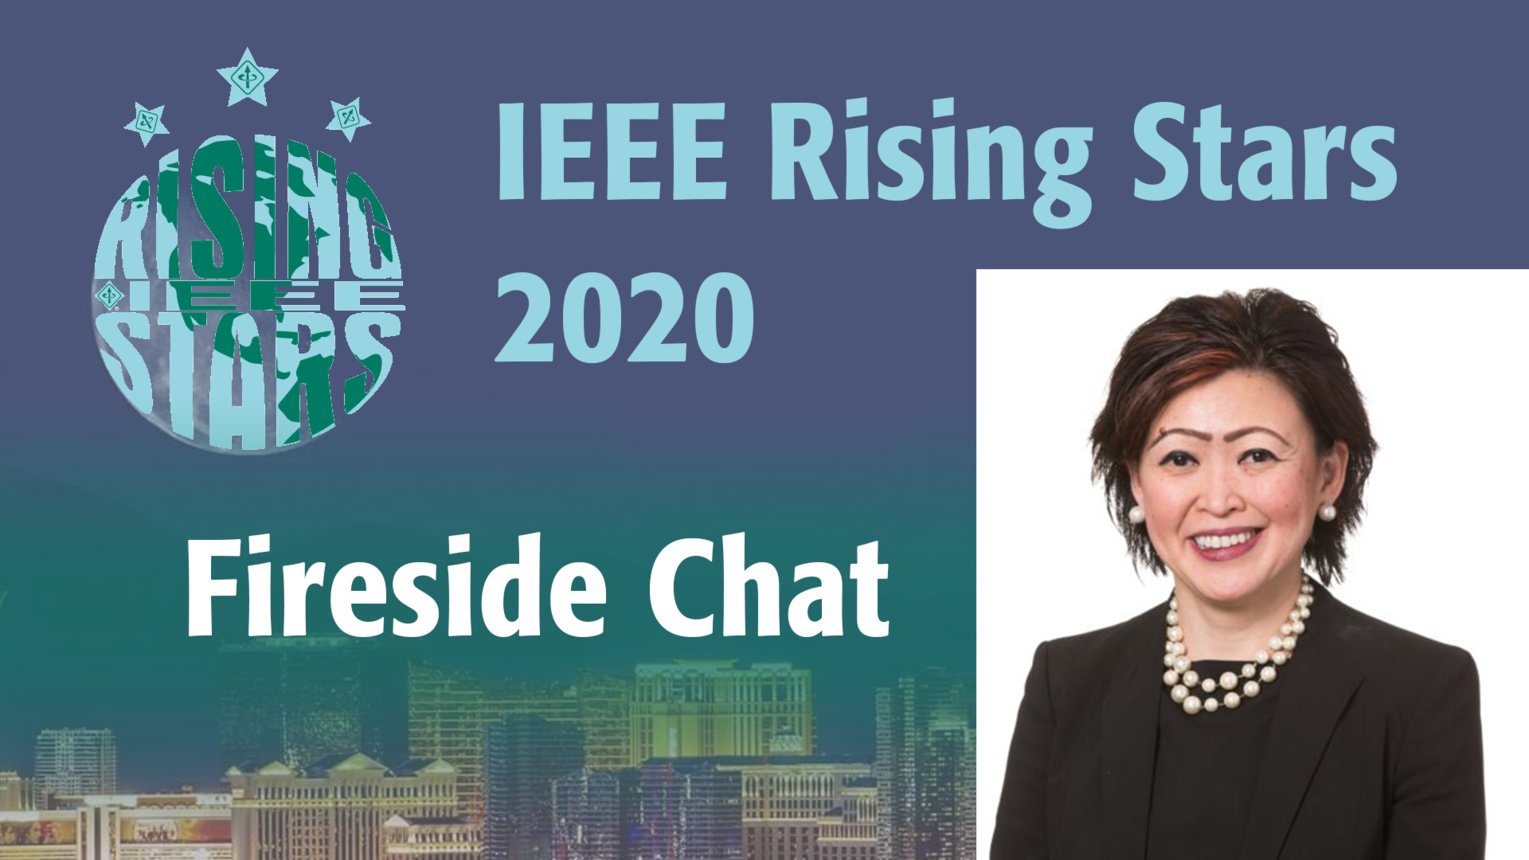 Sonita Lontoh - Fireside Chat - IEEE Rising Stars 2020